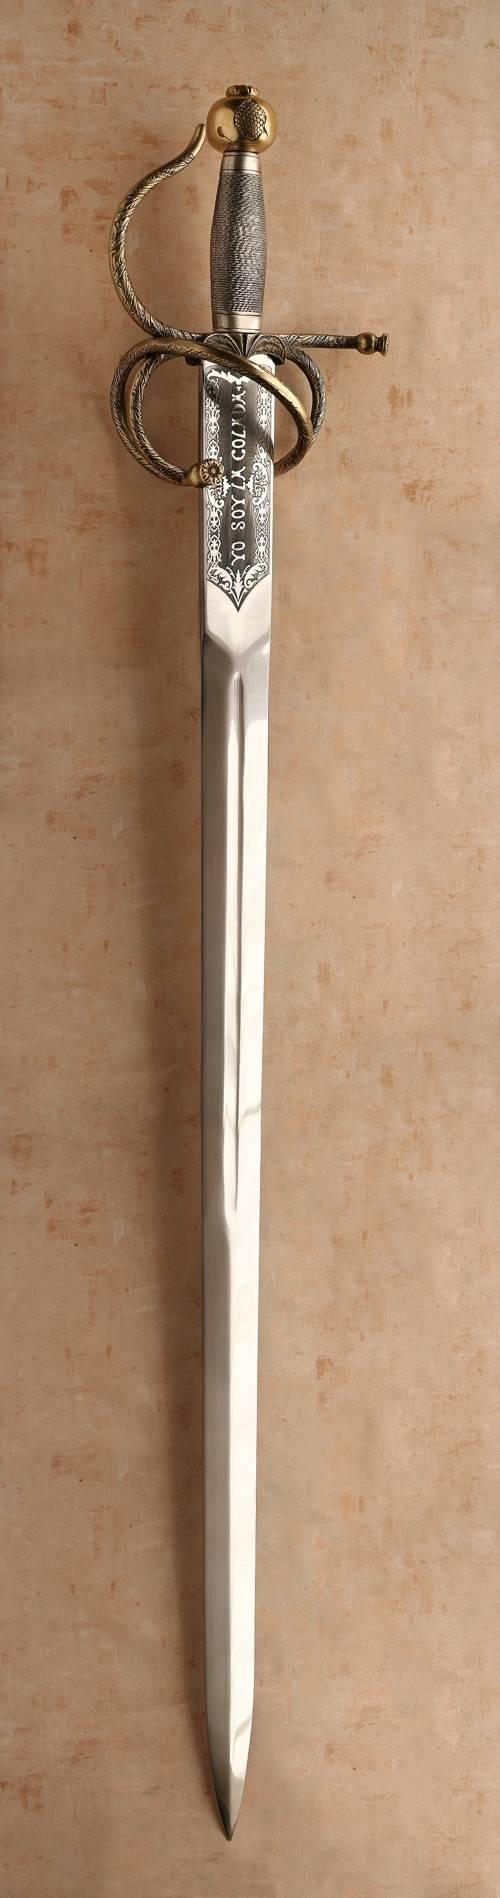 Colada Sword Acero Toledano